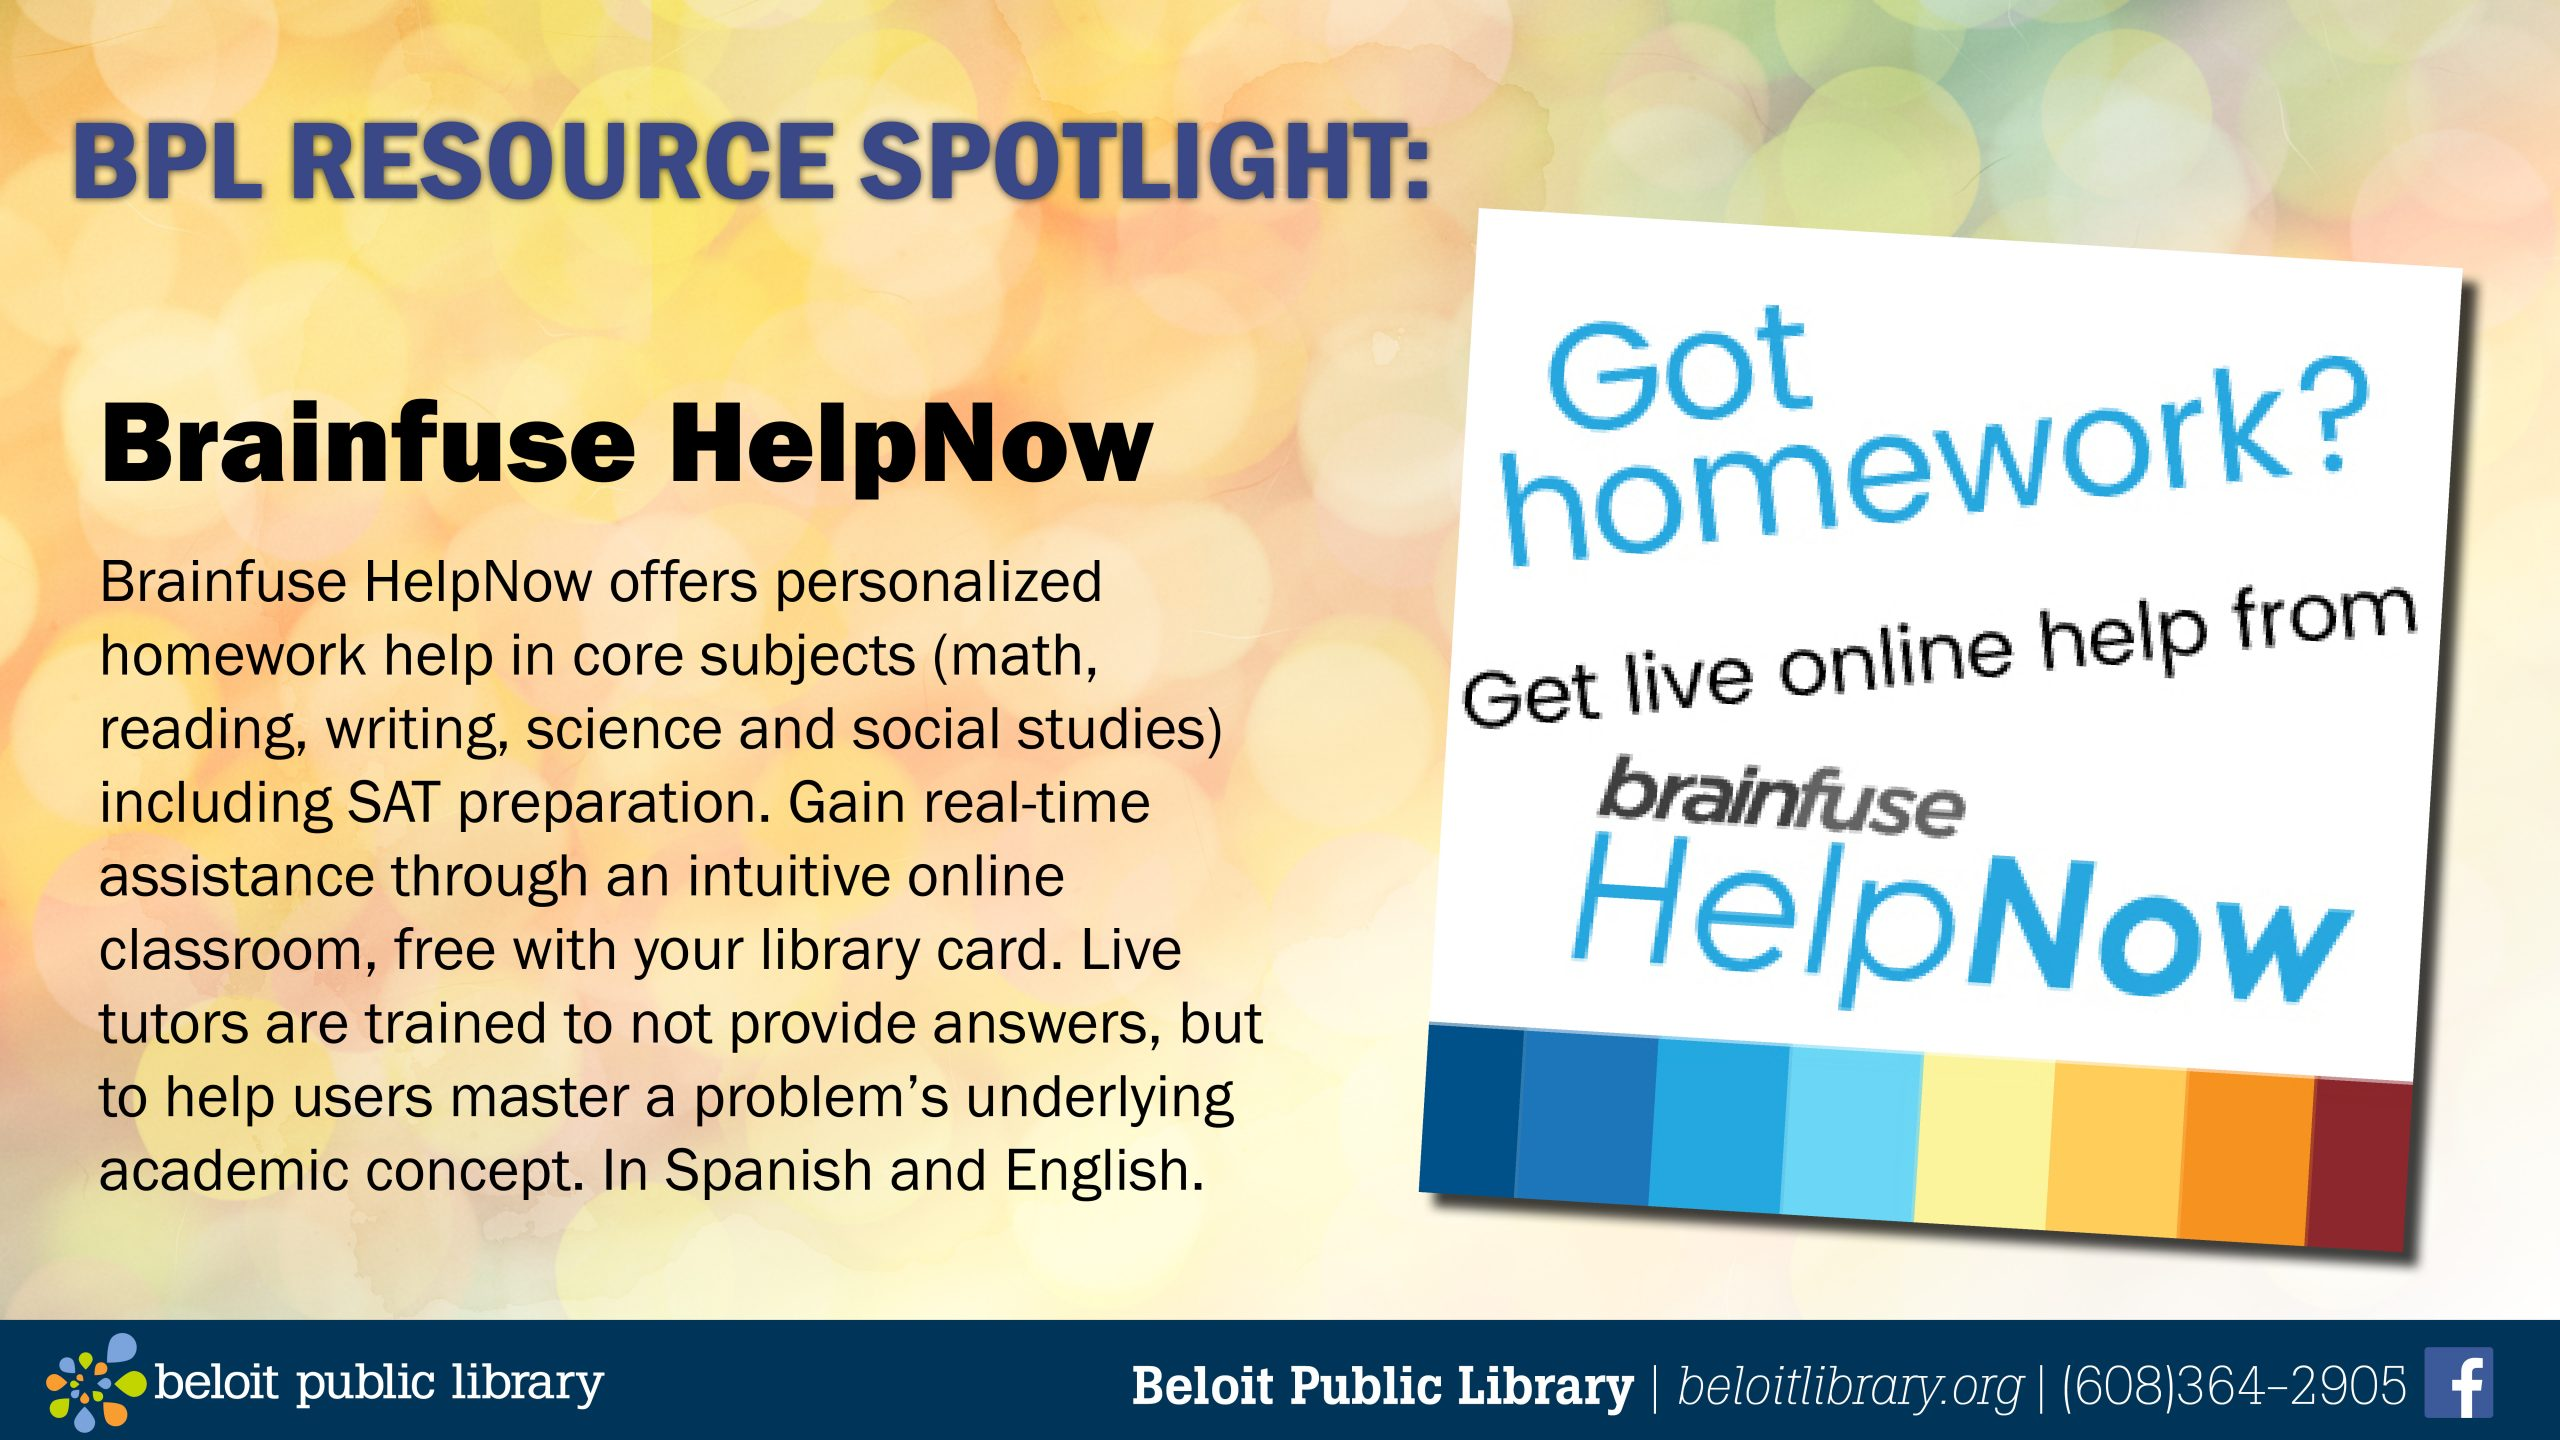 BPL Resource Spotlight: Brainfuse